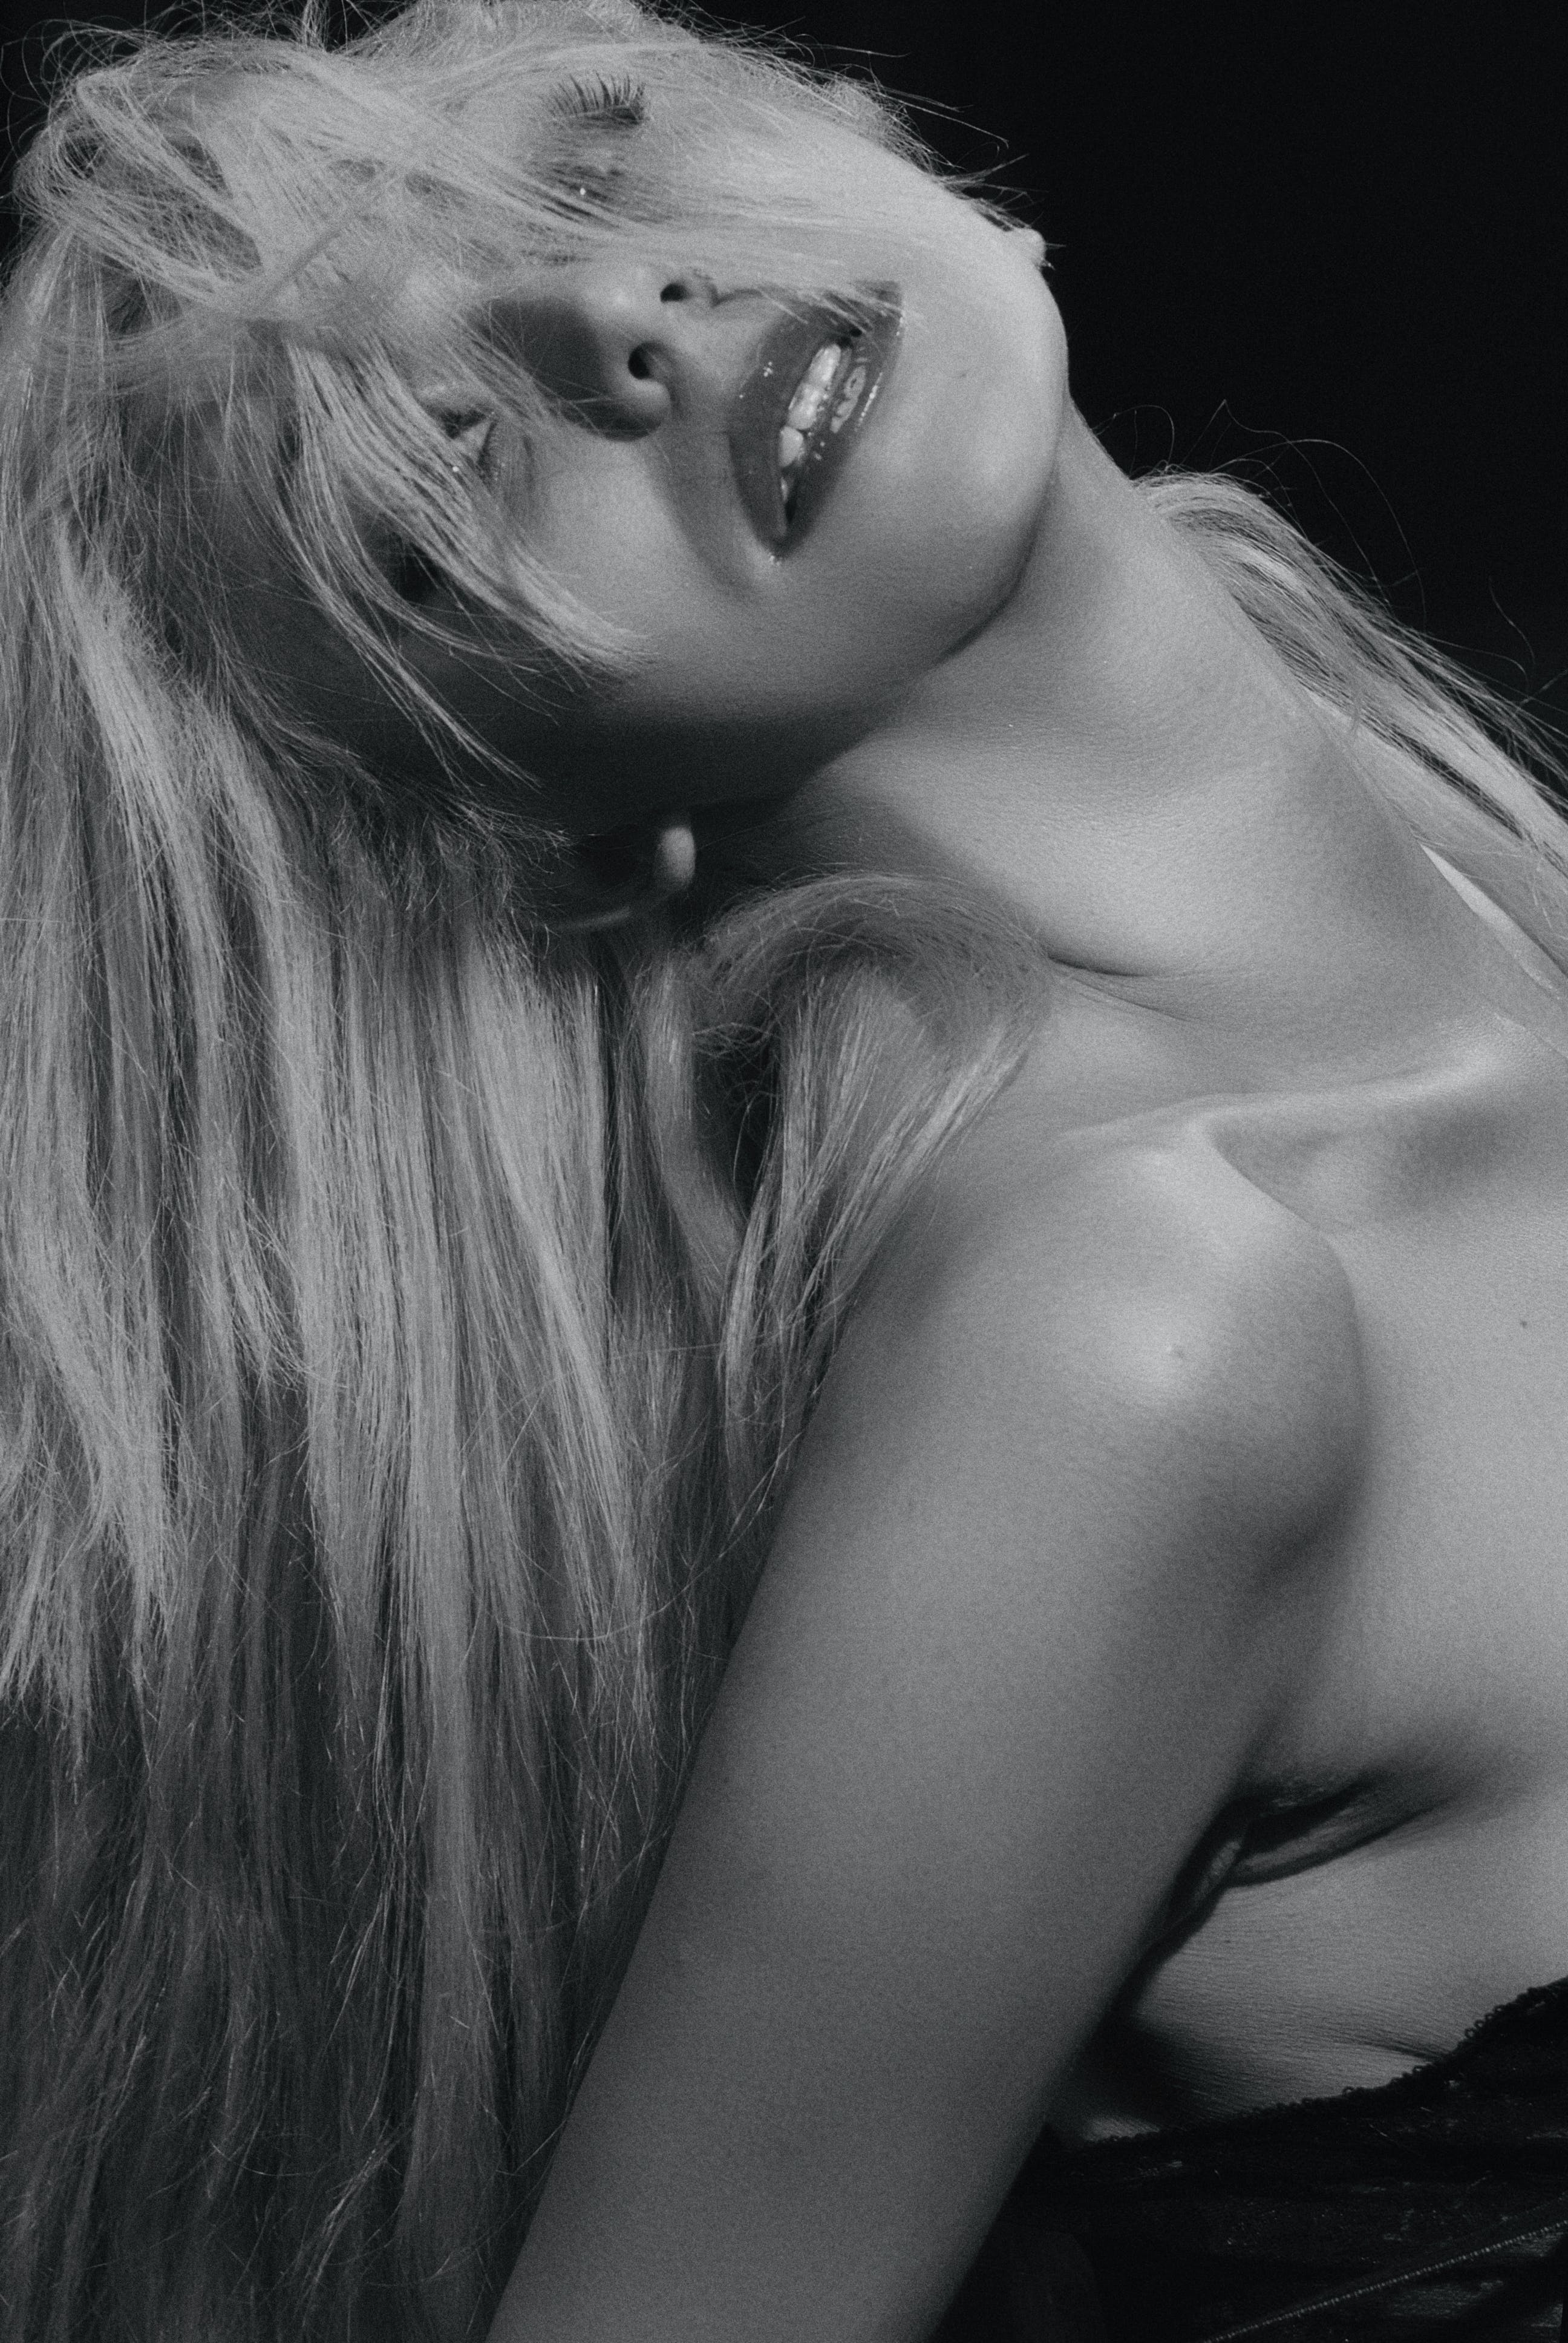 Free stock photo of блондинка, девушка, портрет, студия